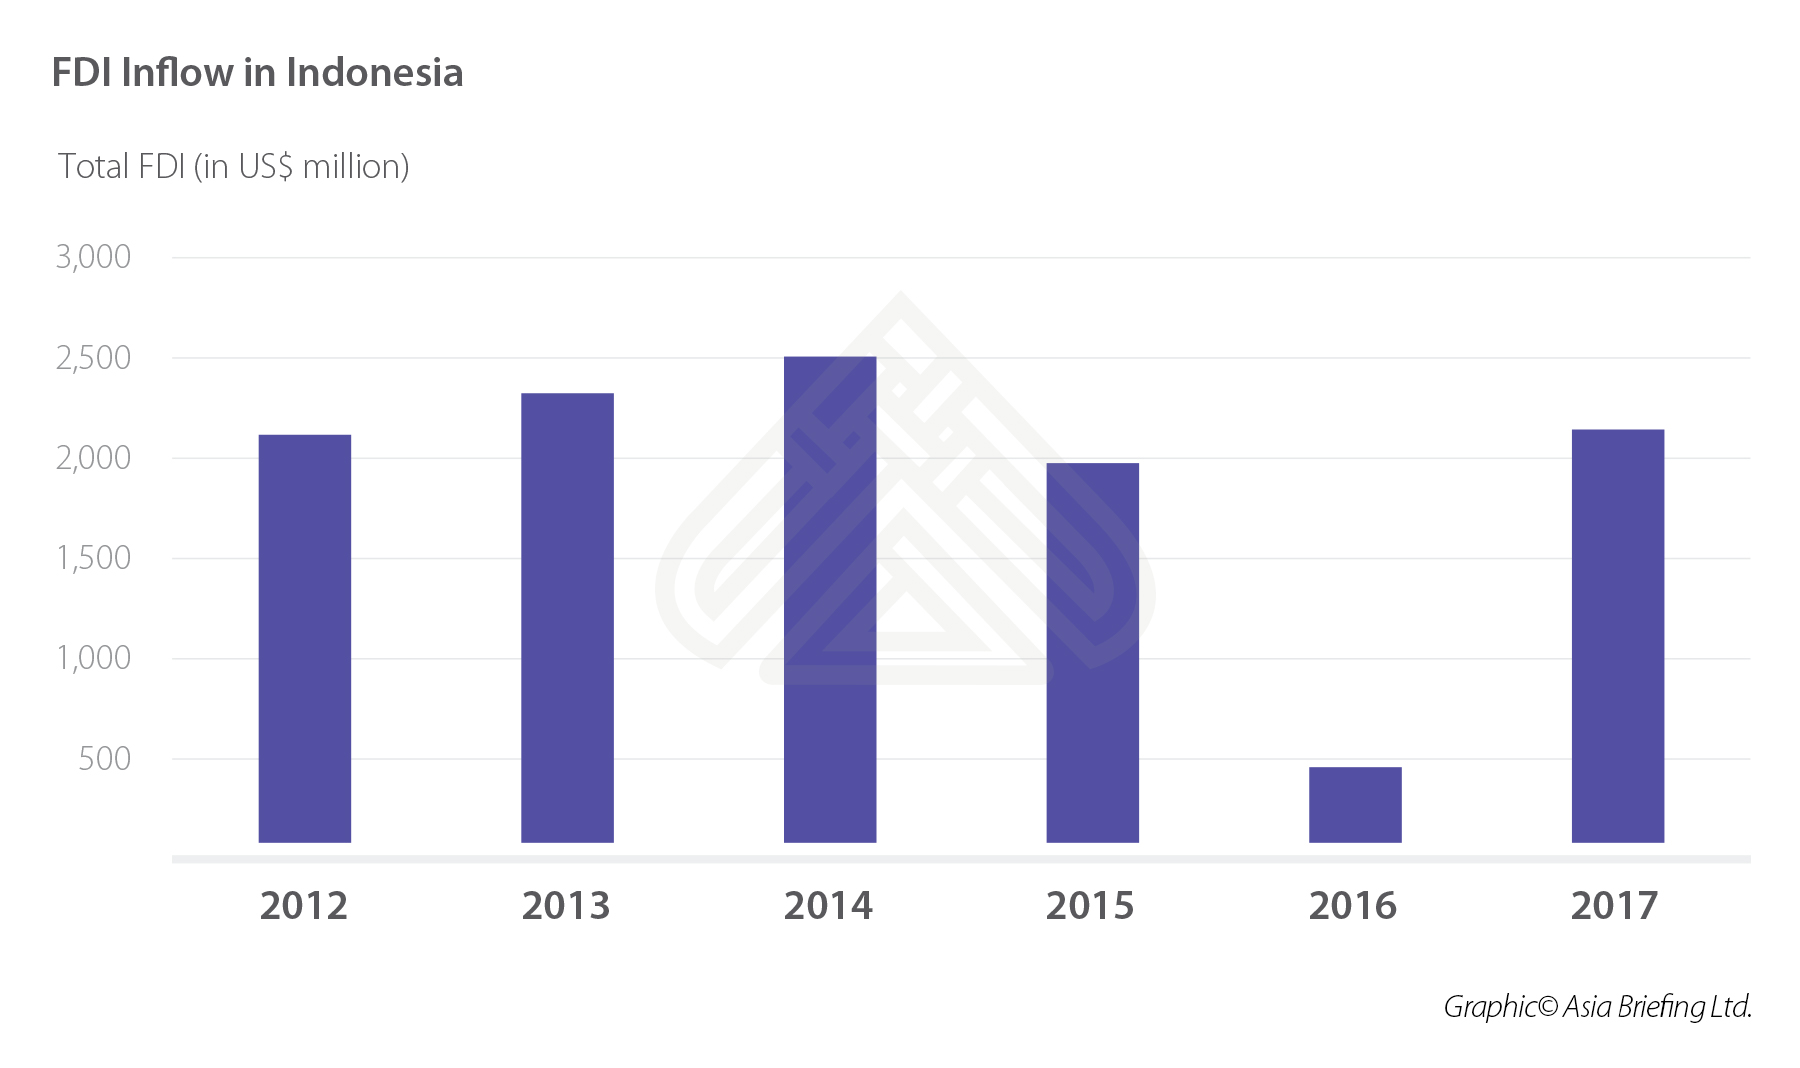 FDI Inflow in Indonesia (002)